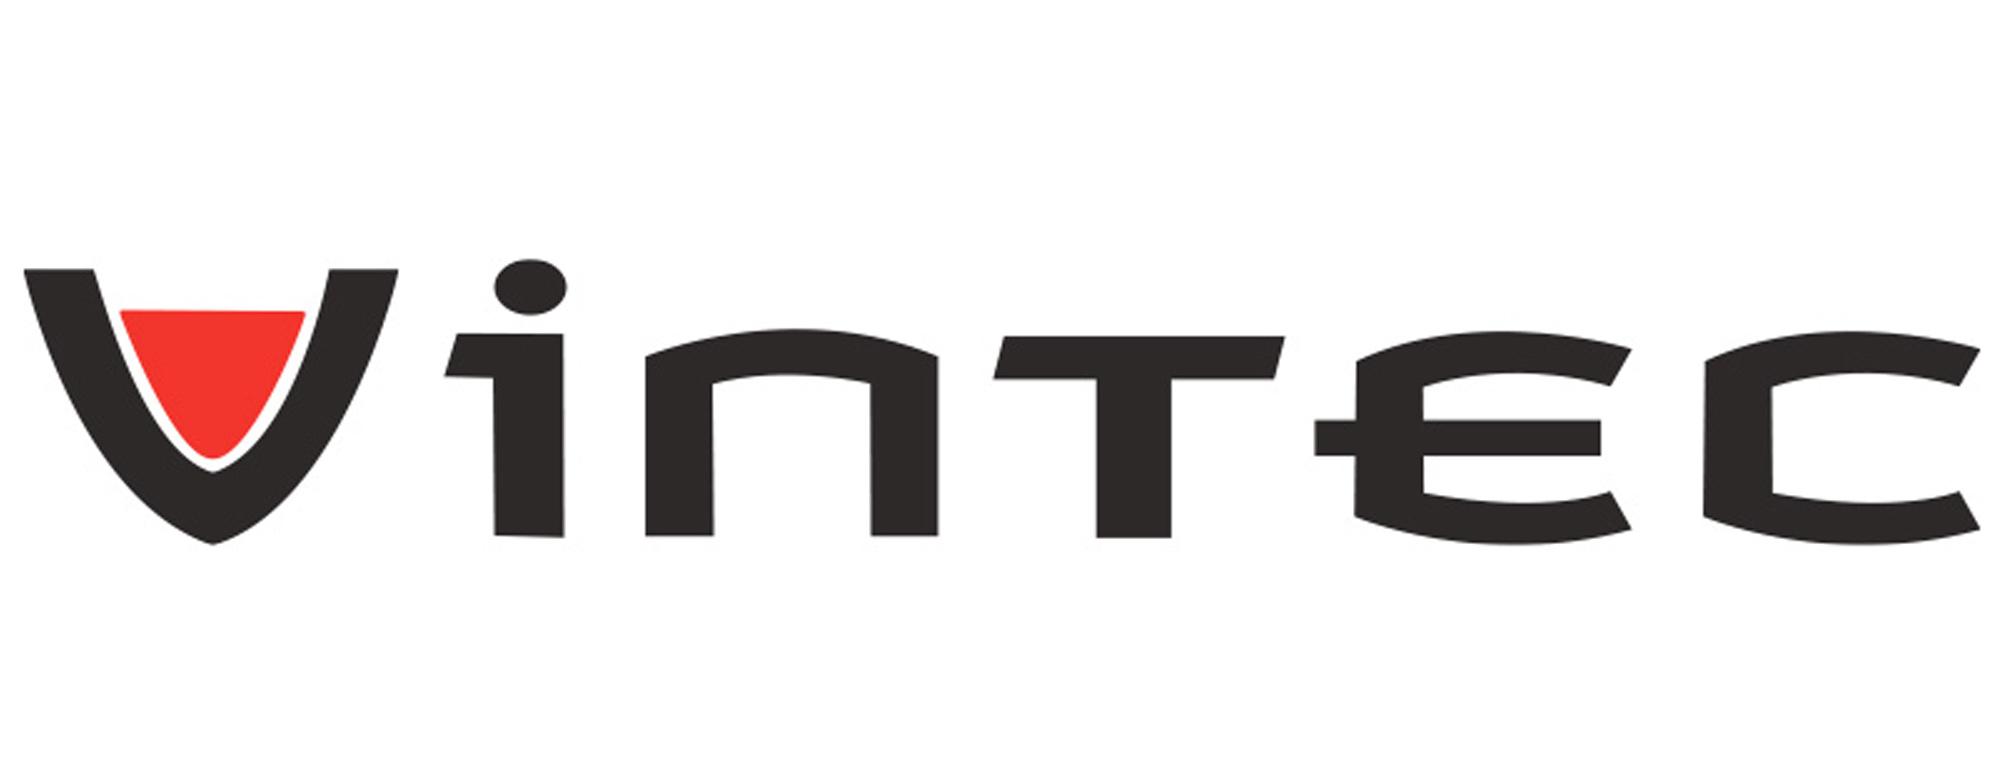 vintec-logo.jpg